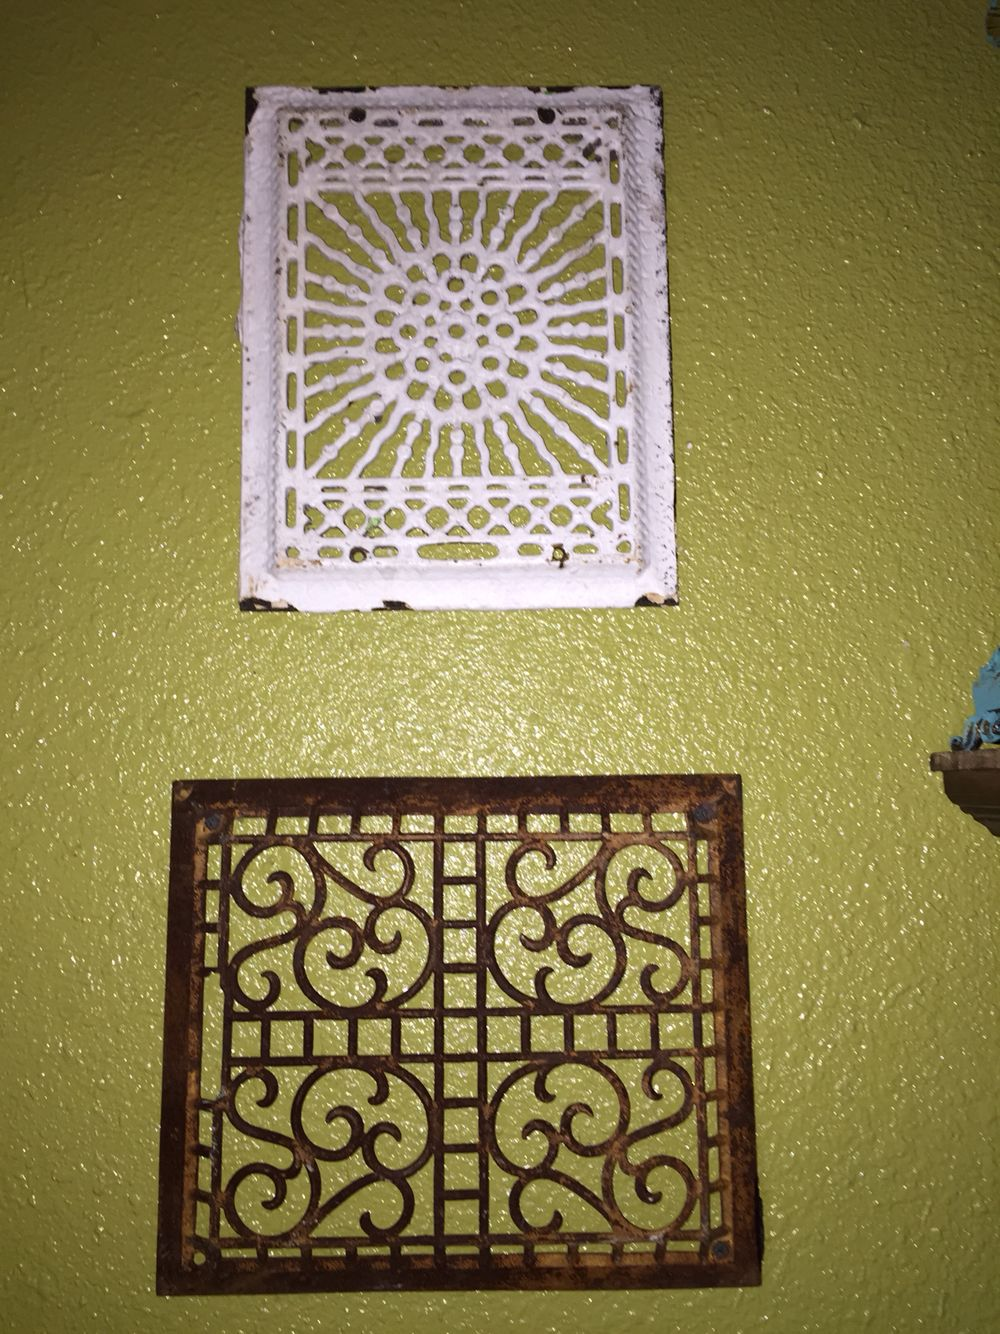 Antique vent covers